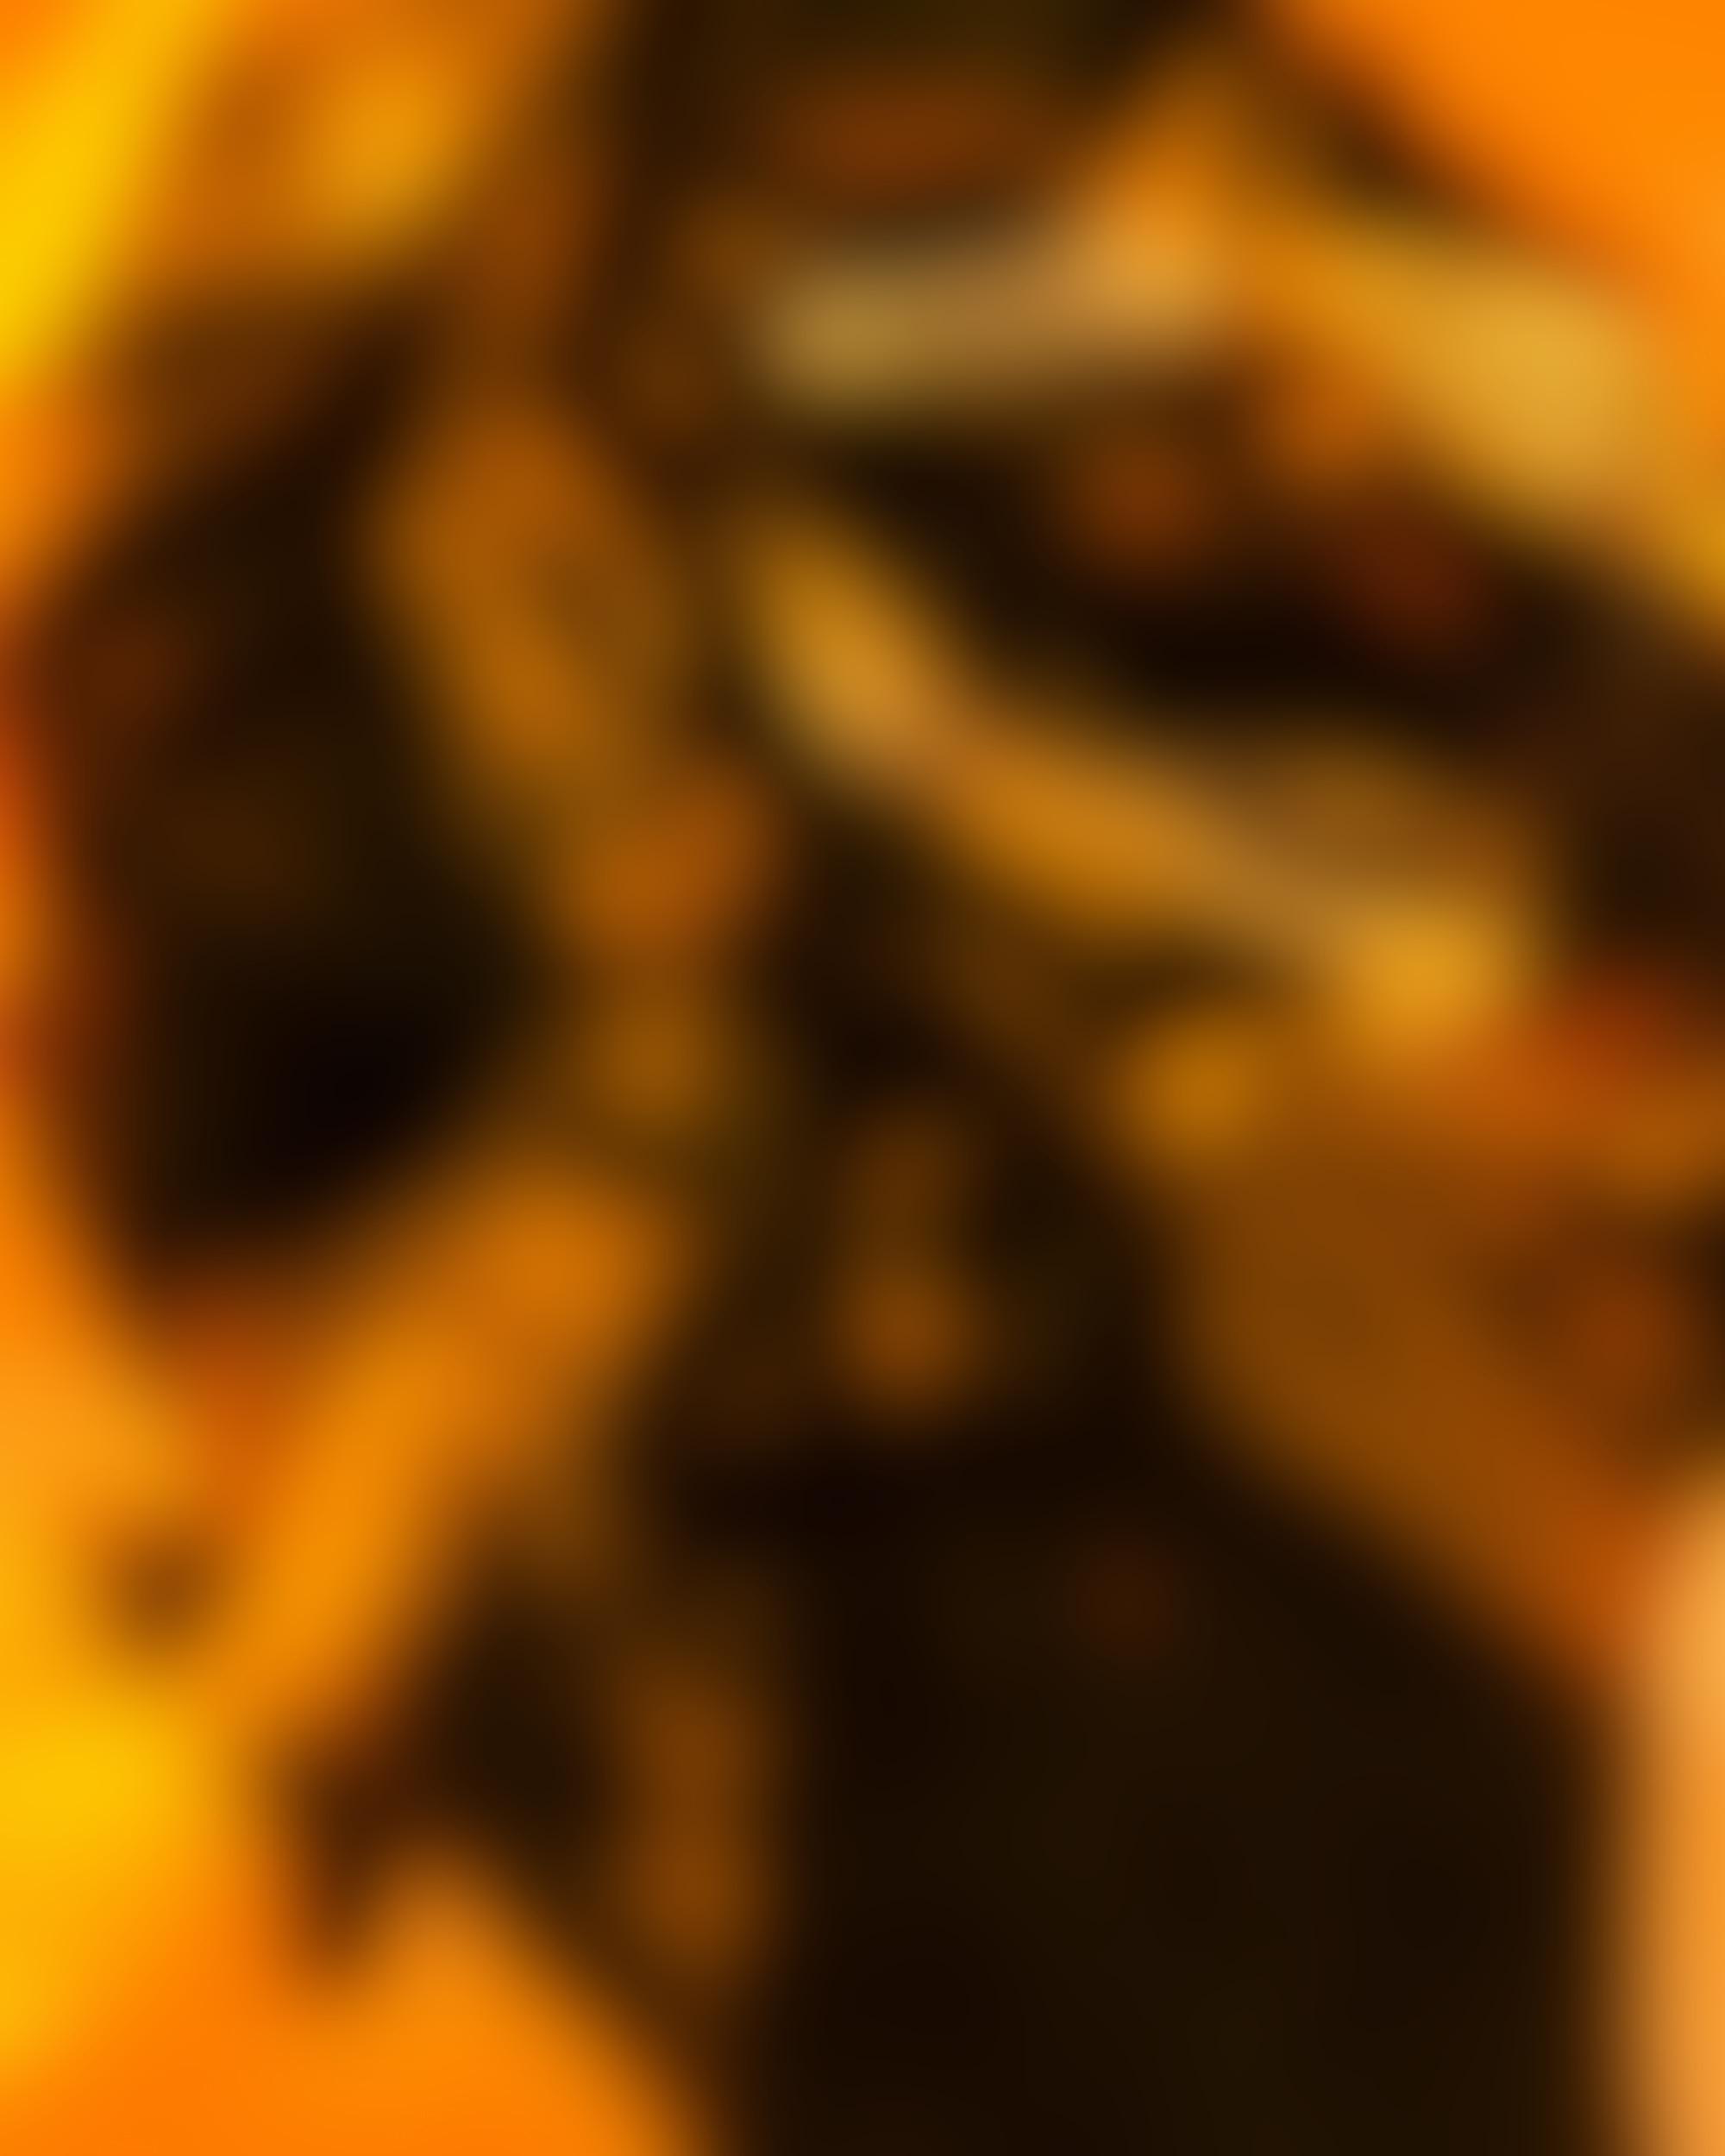 Dawit nm film photography lectureinprogress 09 autocompressfitresizeixlibphp 1 1 0max h2000max w3 D2000q80safe0b911968bae5fa51ec81258b56fc7